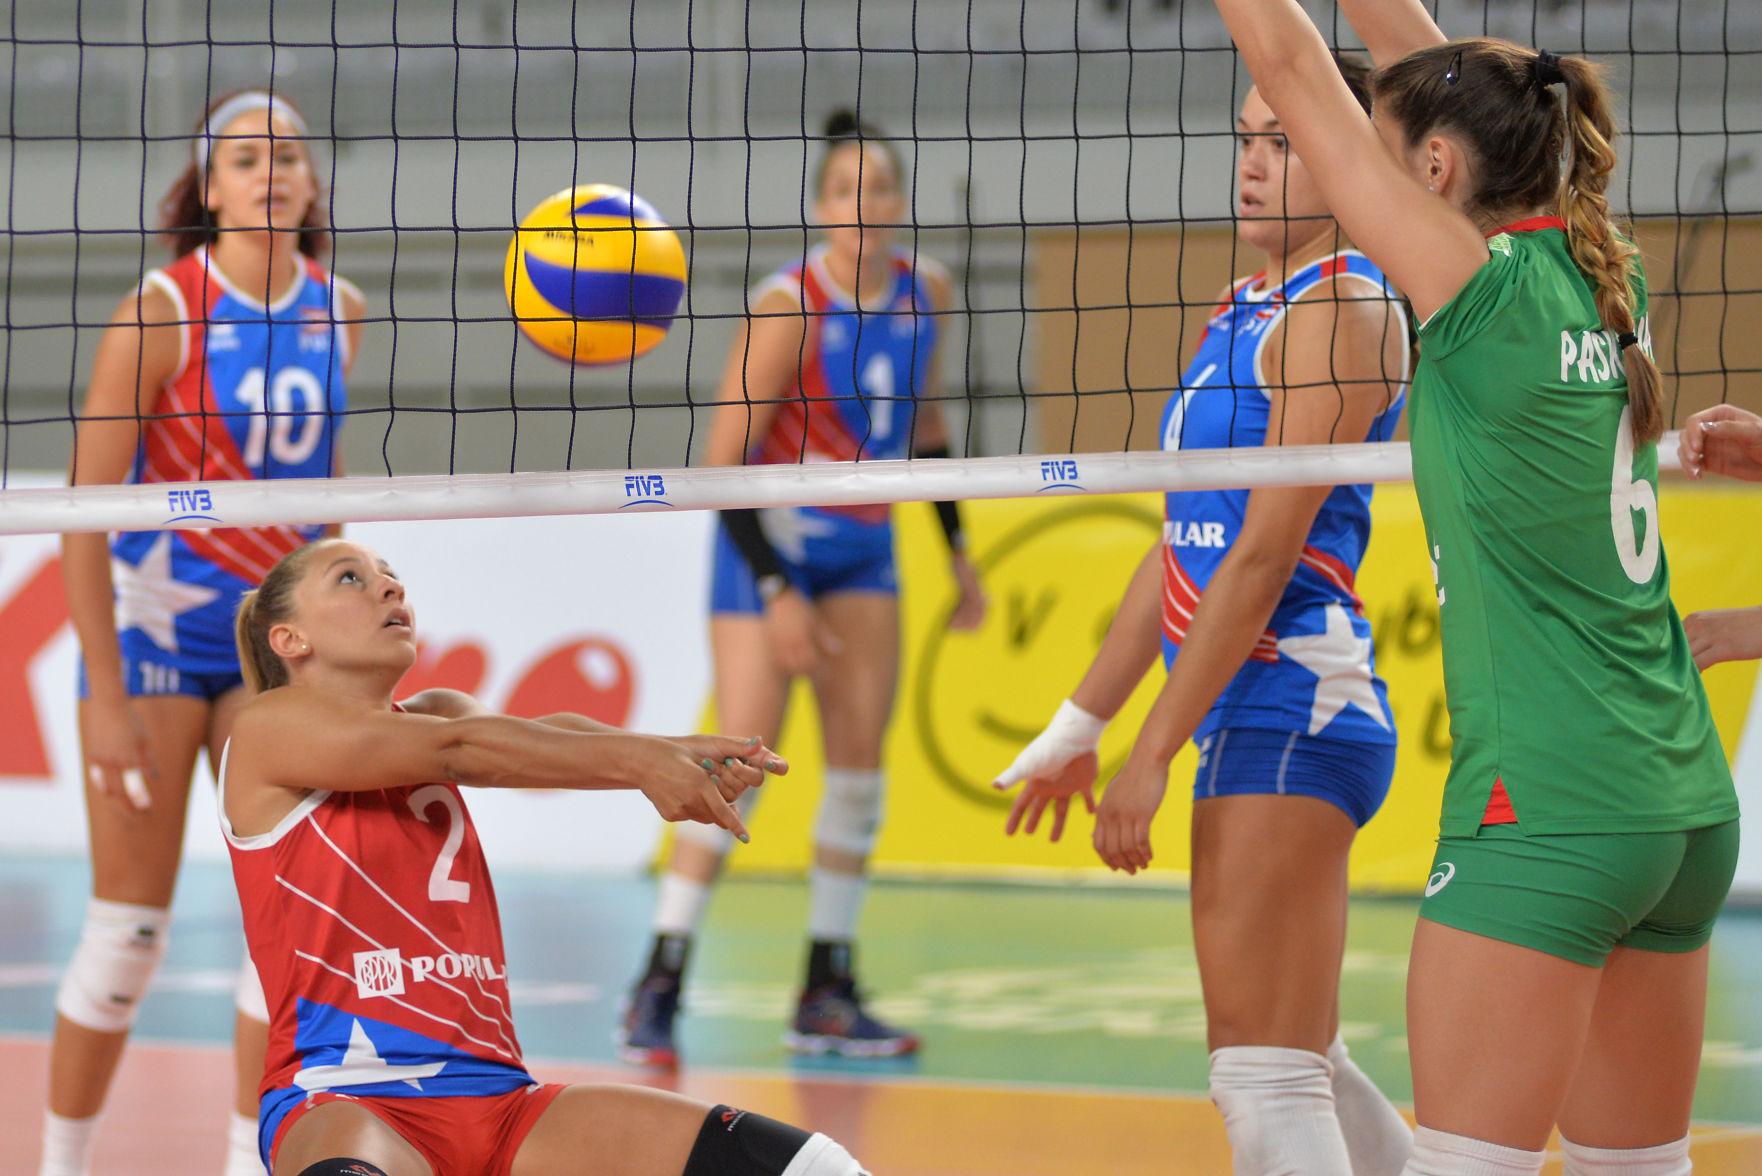 Con Helena Vidal, Las Panteras cortaron la racha negativa ante Croacia